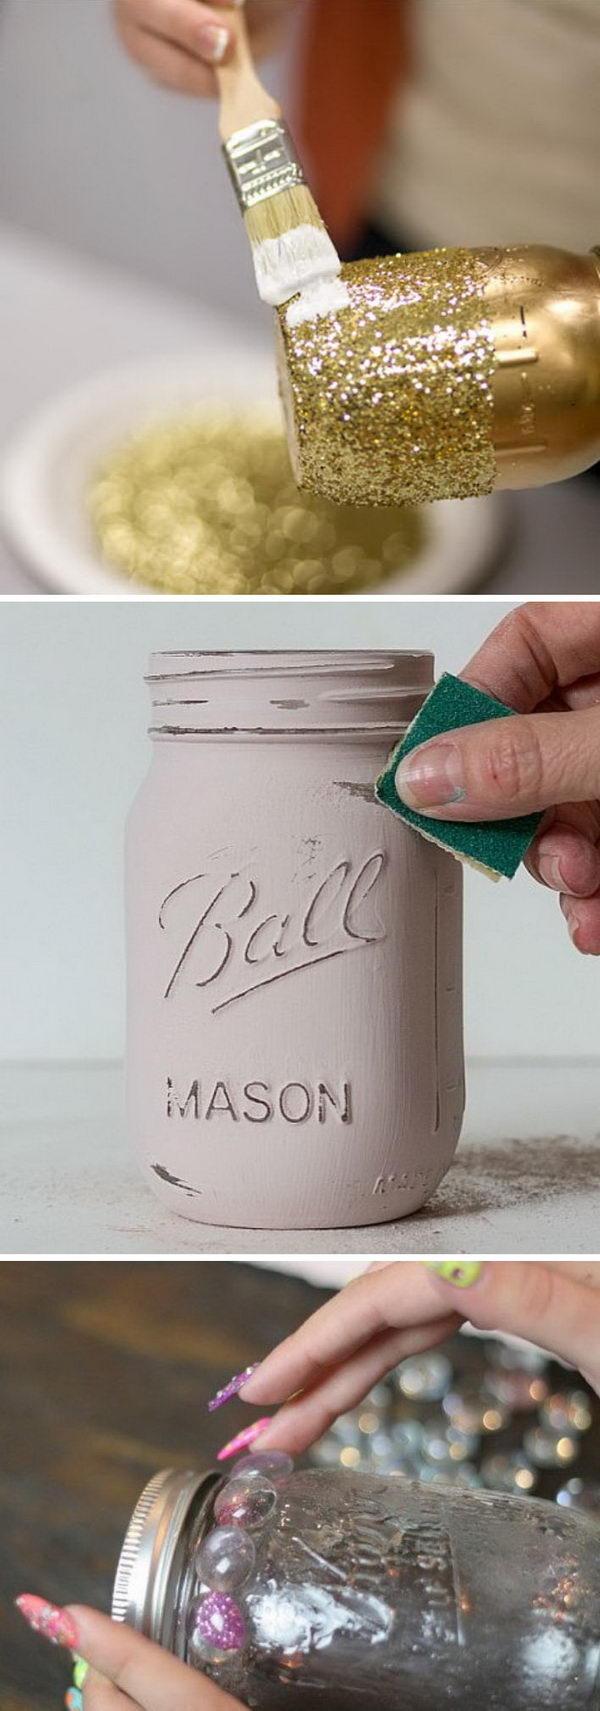 Awesome DIY Projects Using Mason Jars.